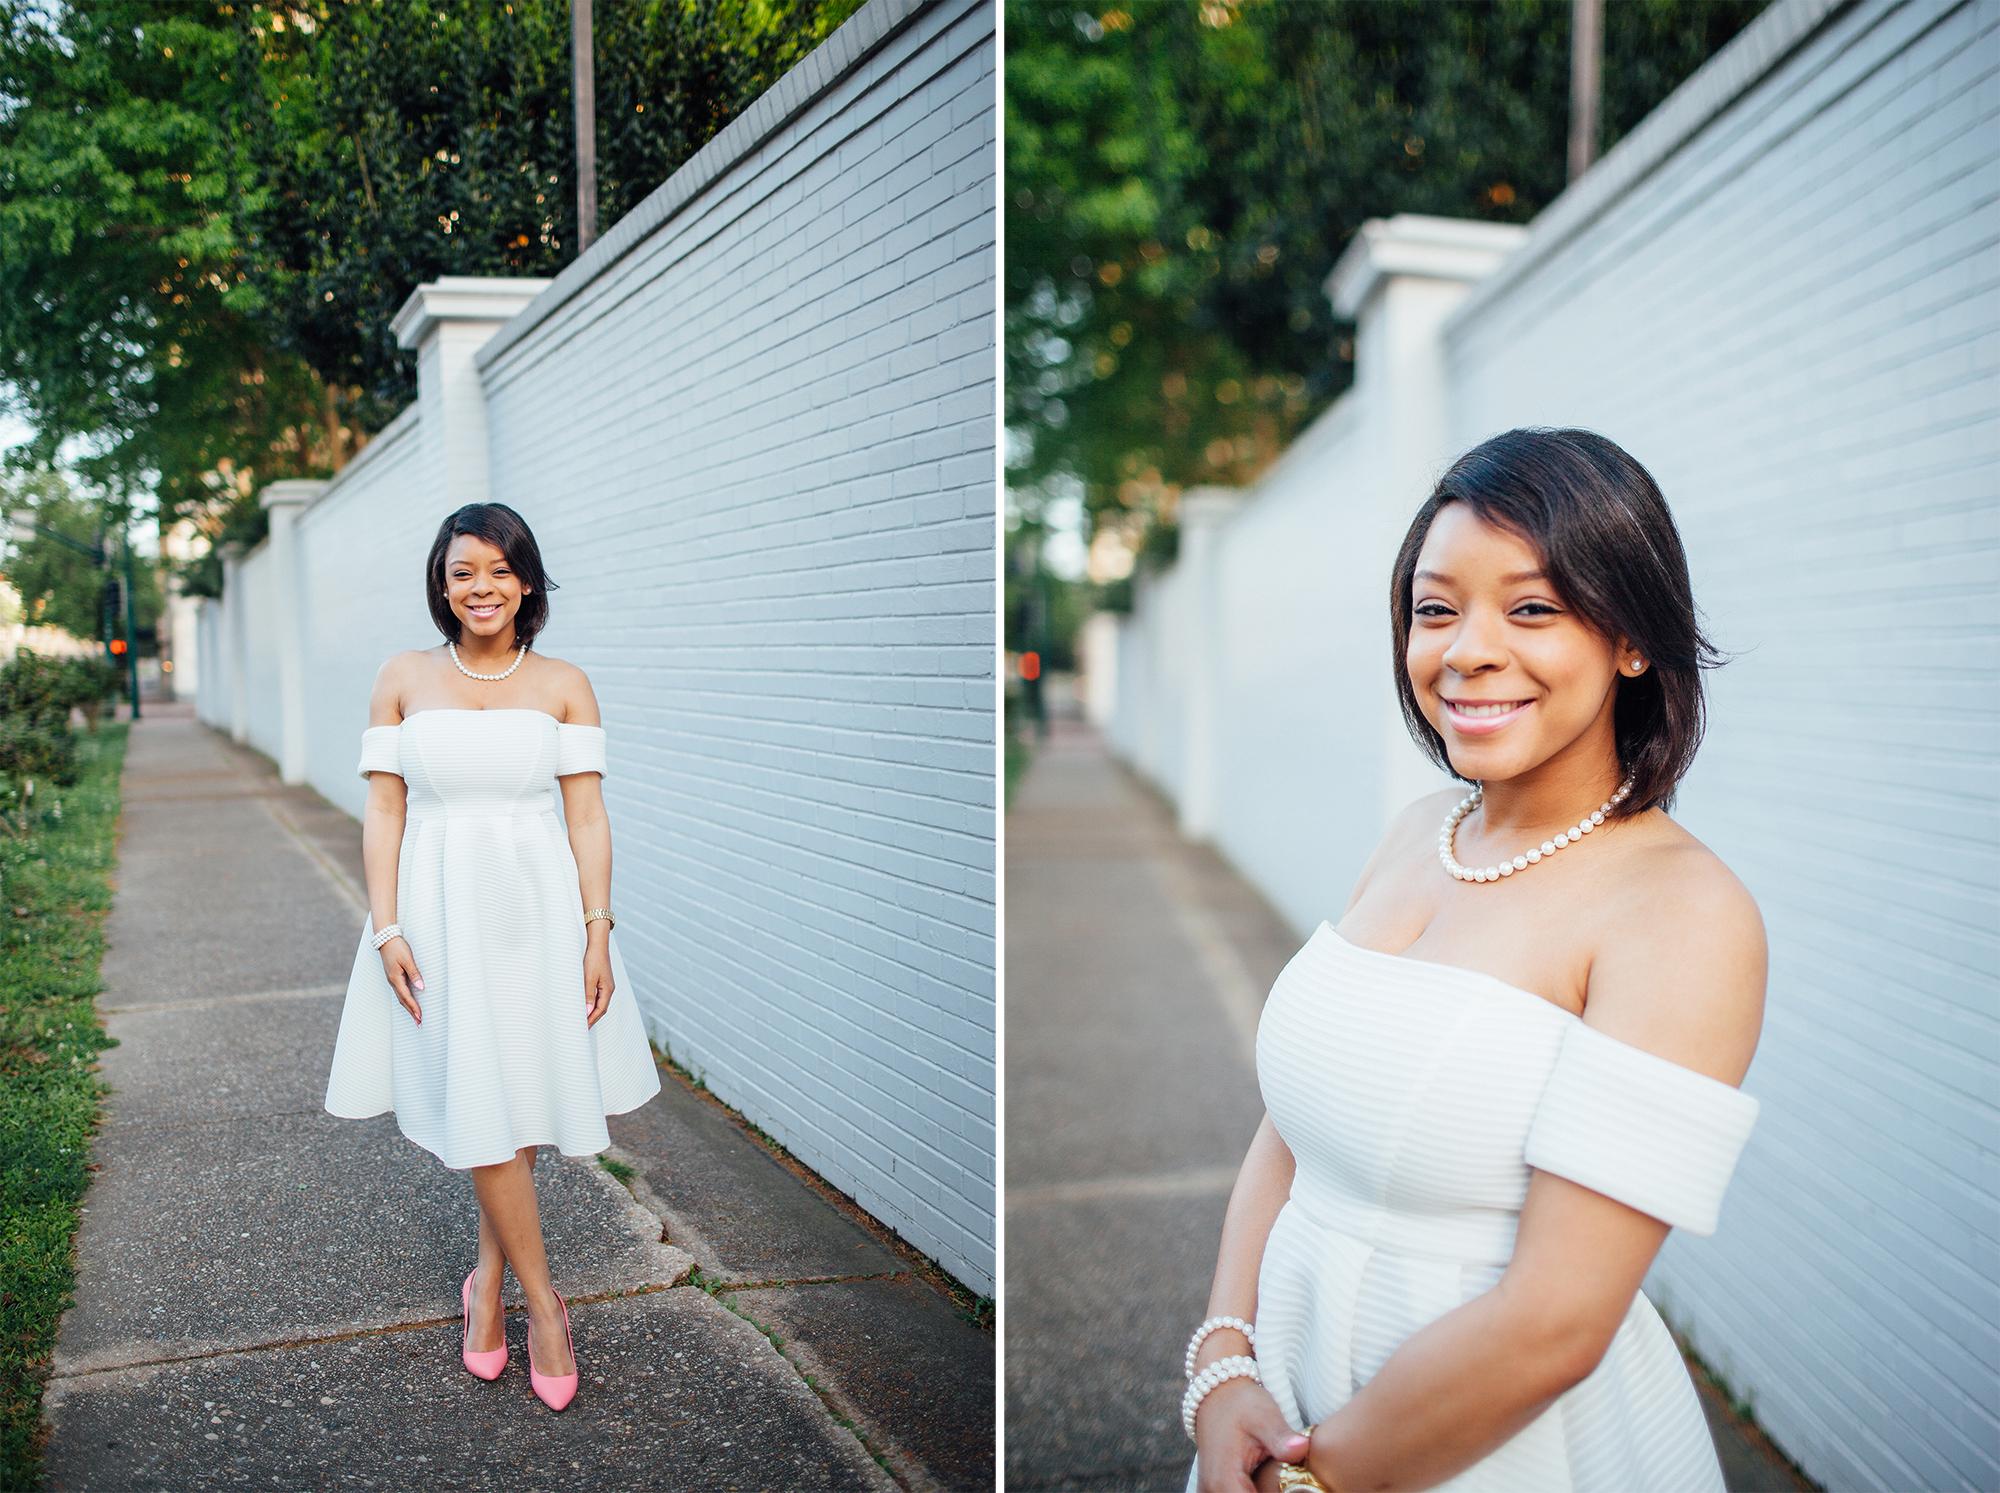 Jasmine_1 copy.jpg